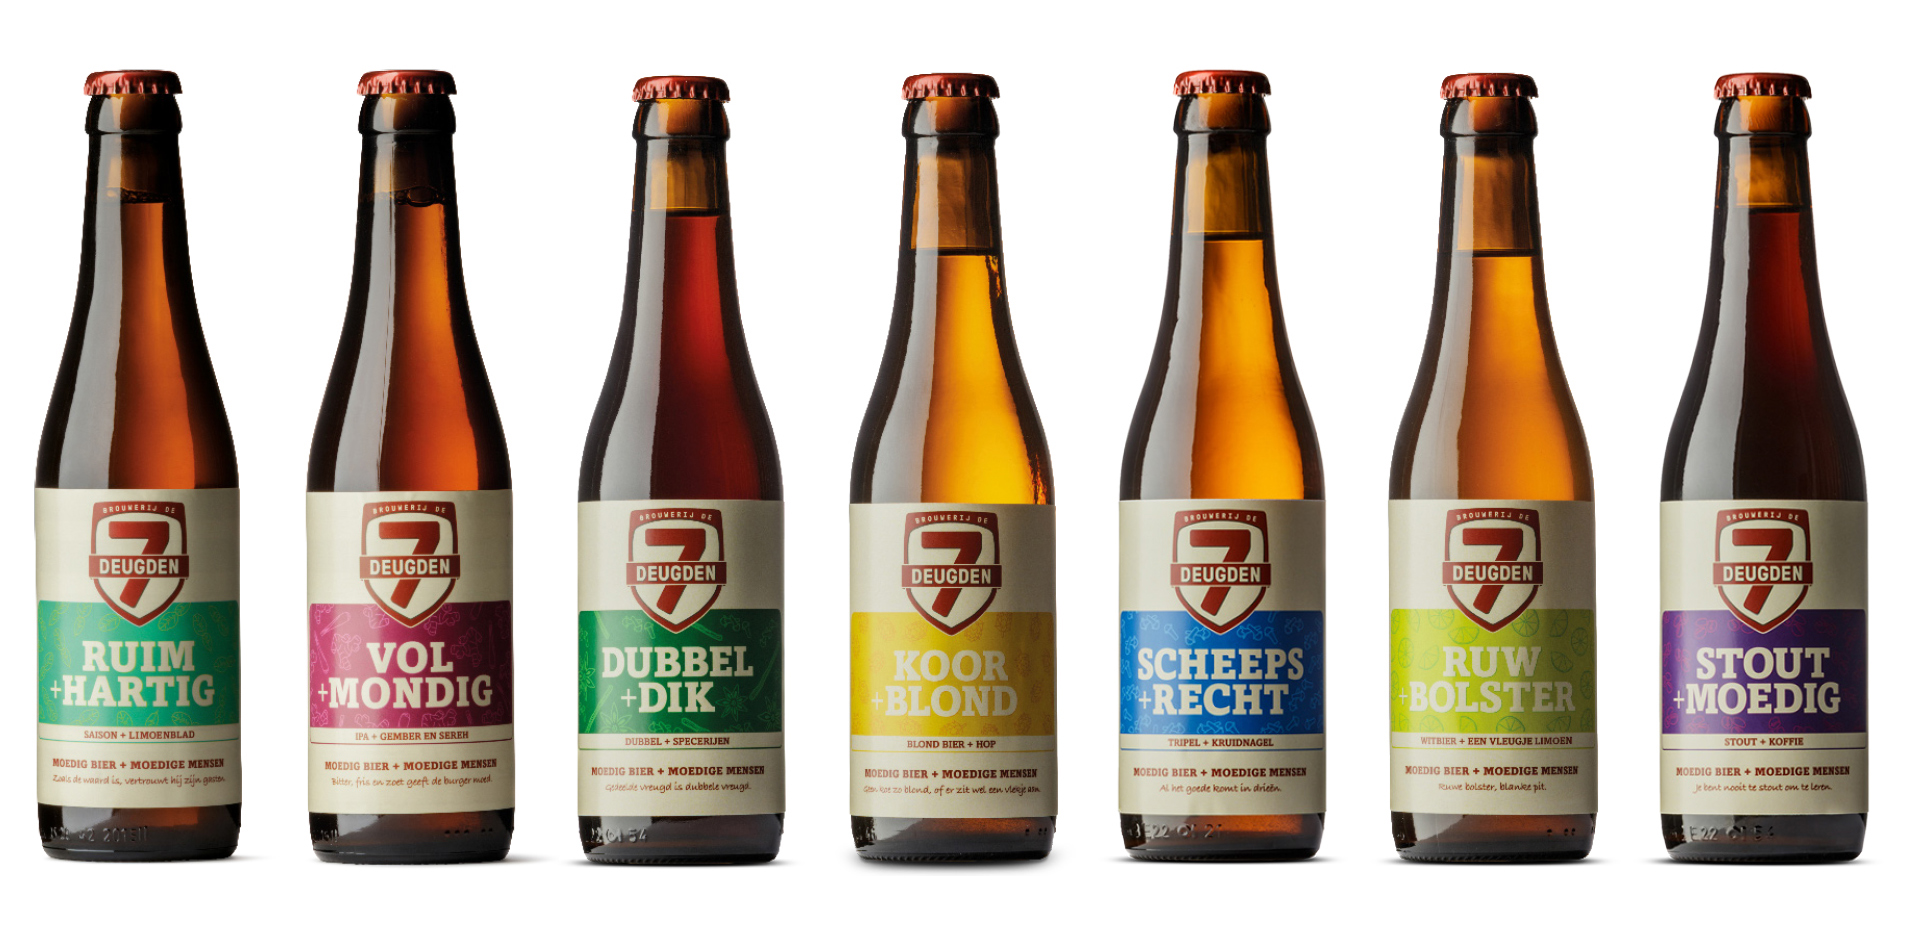 nectar-utrecht-pils-bier-brouwerij-nederland-streekbier-amsterdam-de7deugden-assortiment